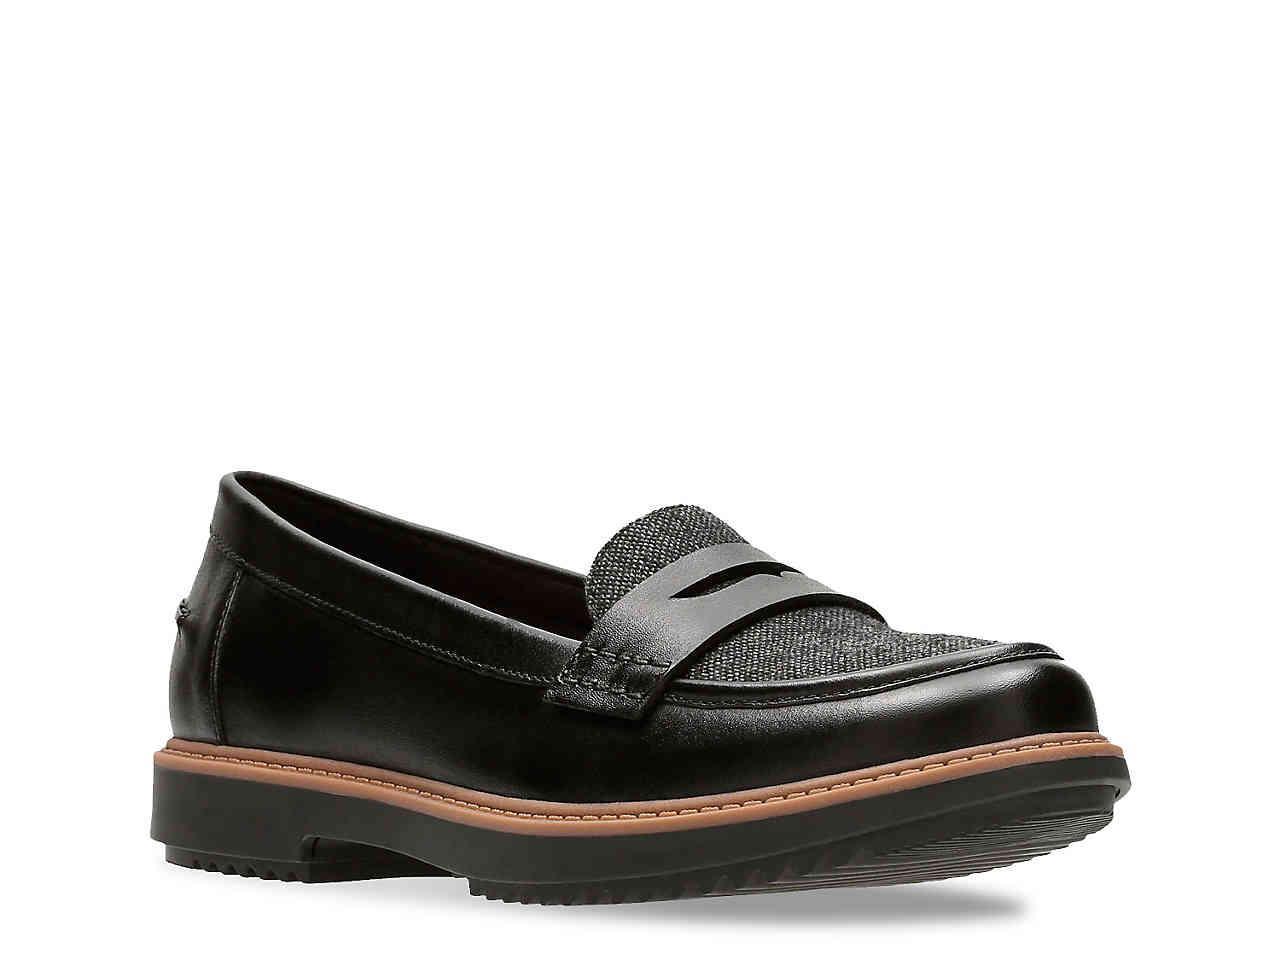 31287a9803d Lyst - Clarks Raise Eletta Loafer in Black